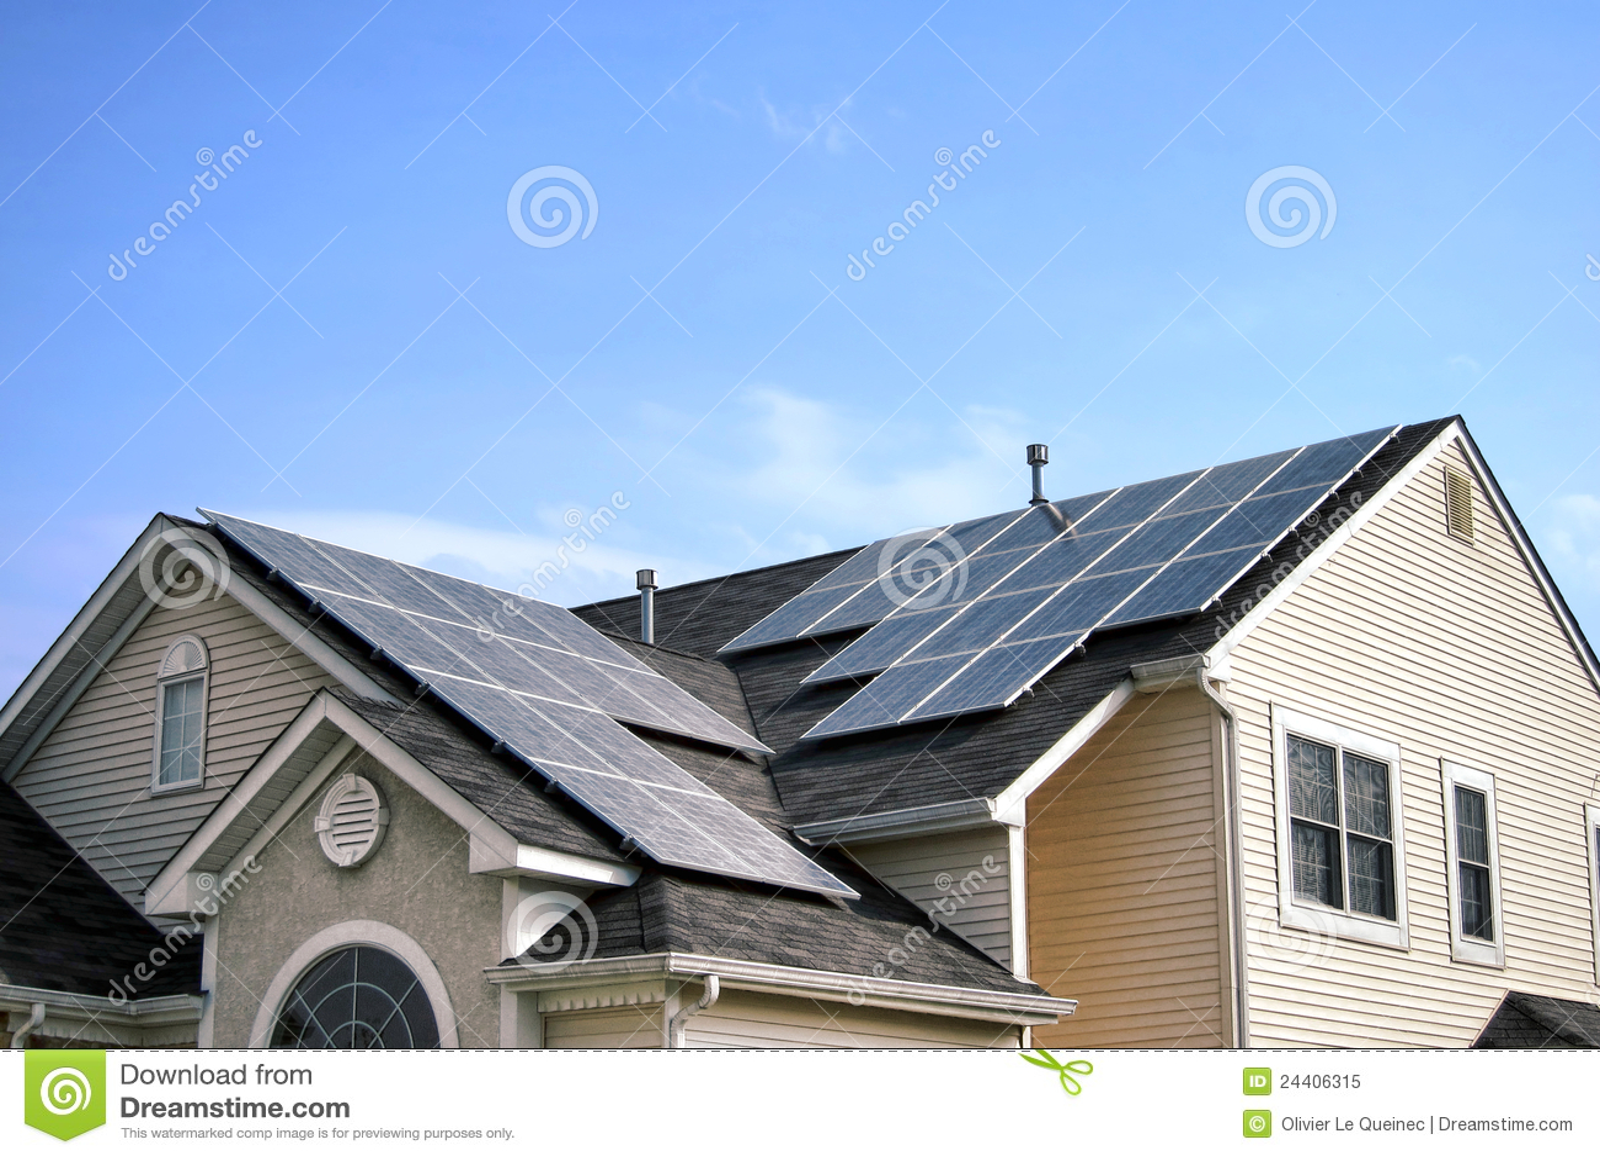 Renewable Green Energy Solar Panels On House Roof Royalty